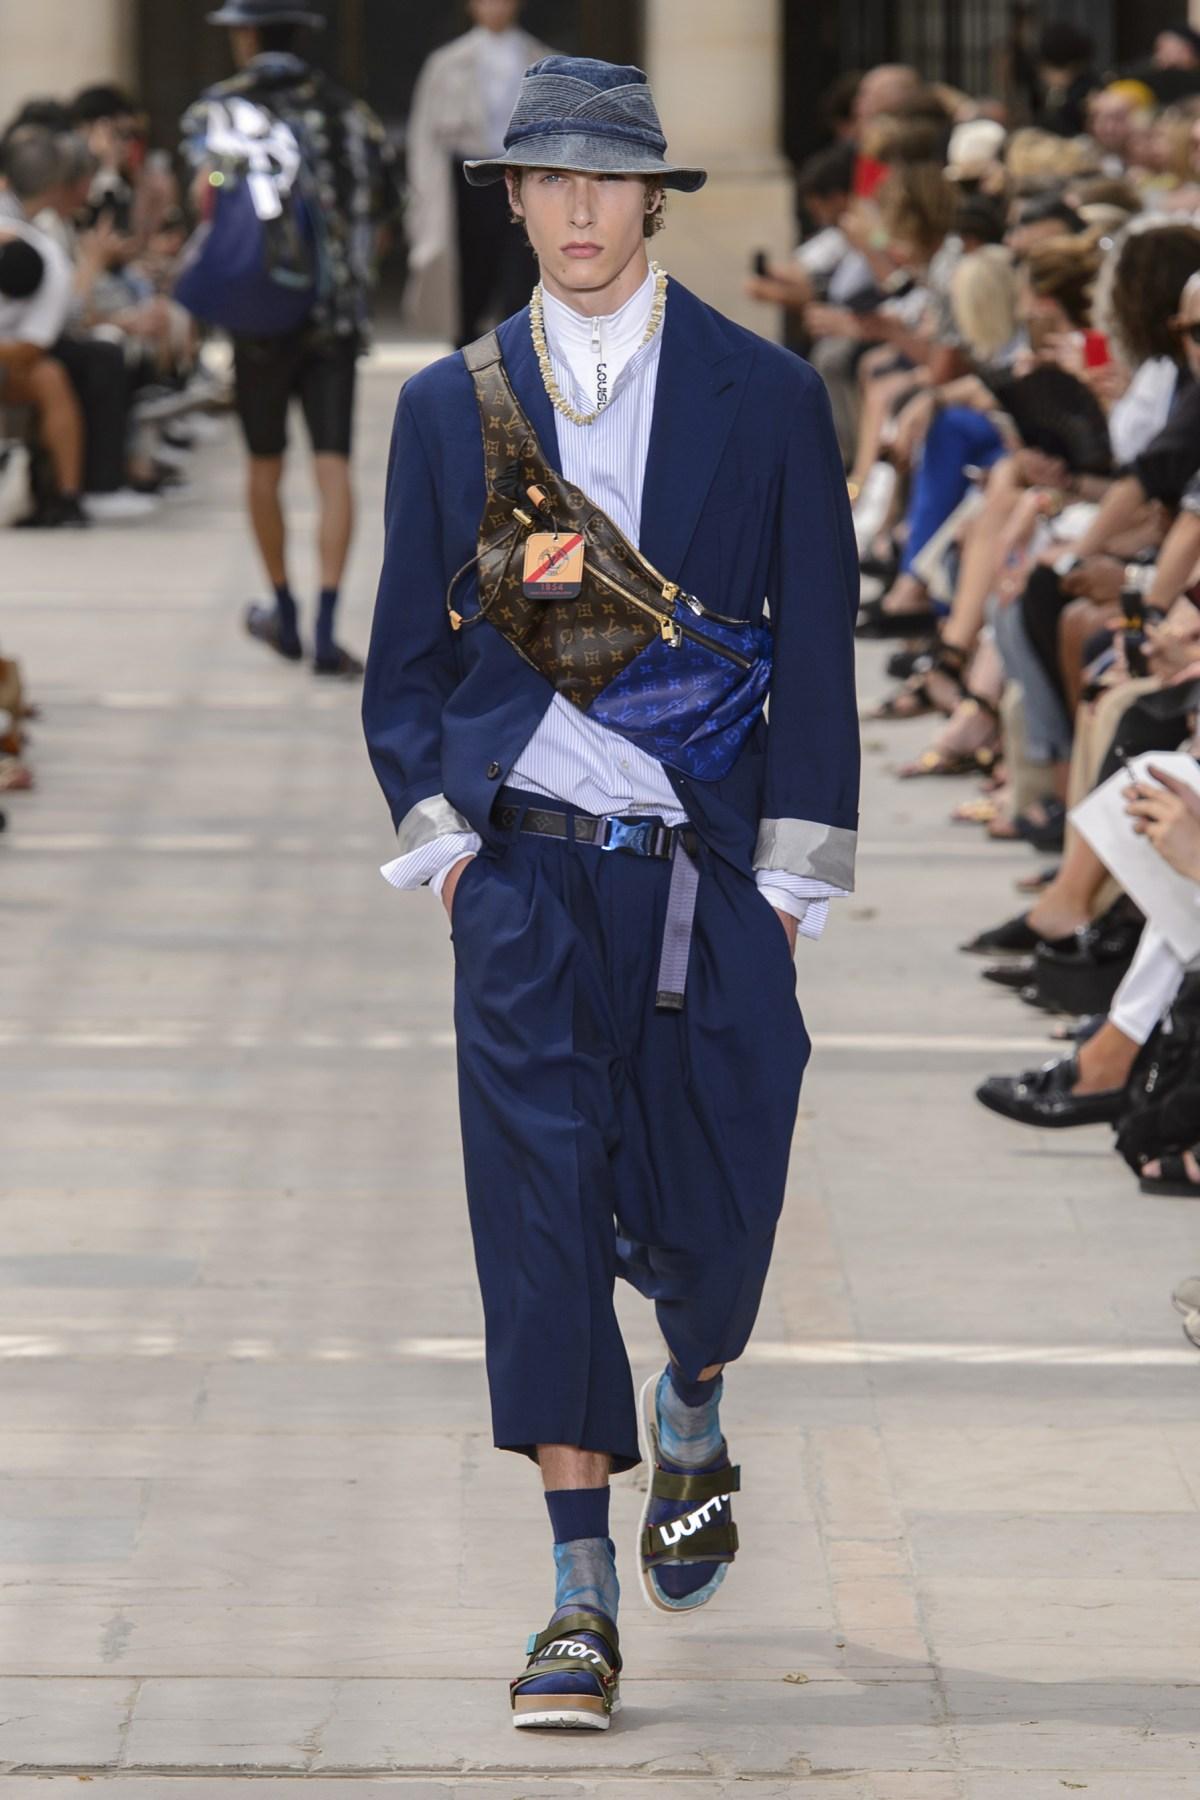 2018 Men S Thanksgiving Outfits 30 Ways To Dress On: Louis Vuitton Spring 2018 Men's Fashion Show